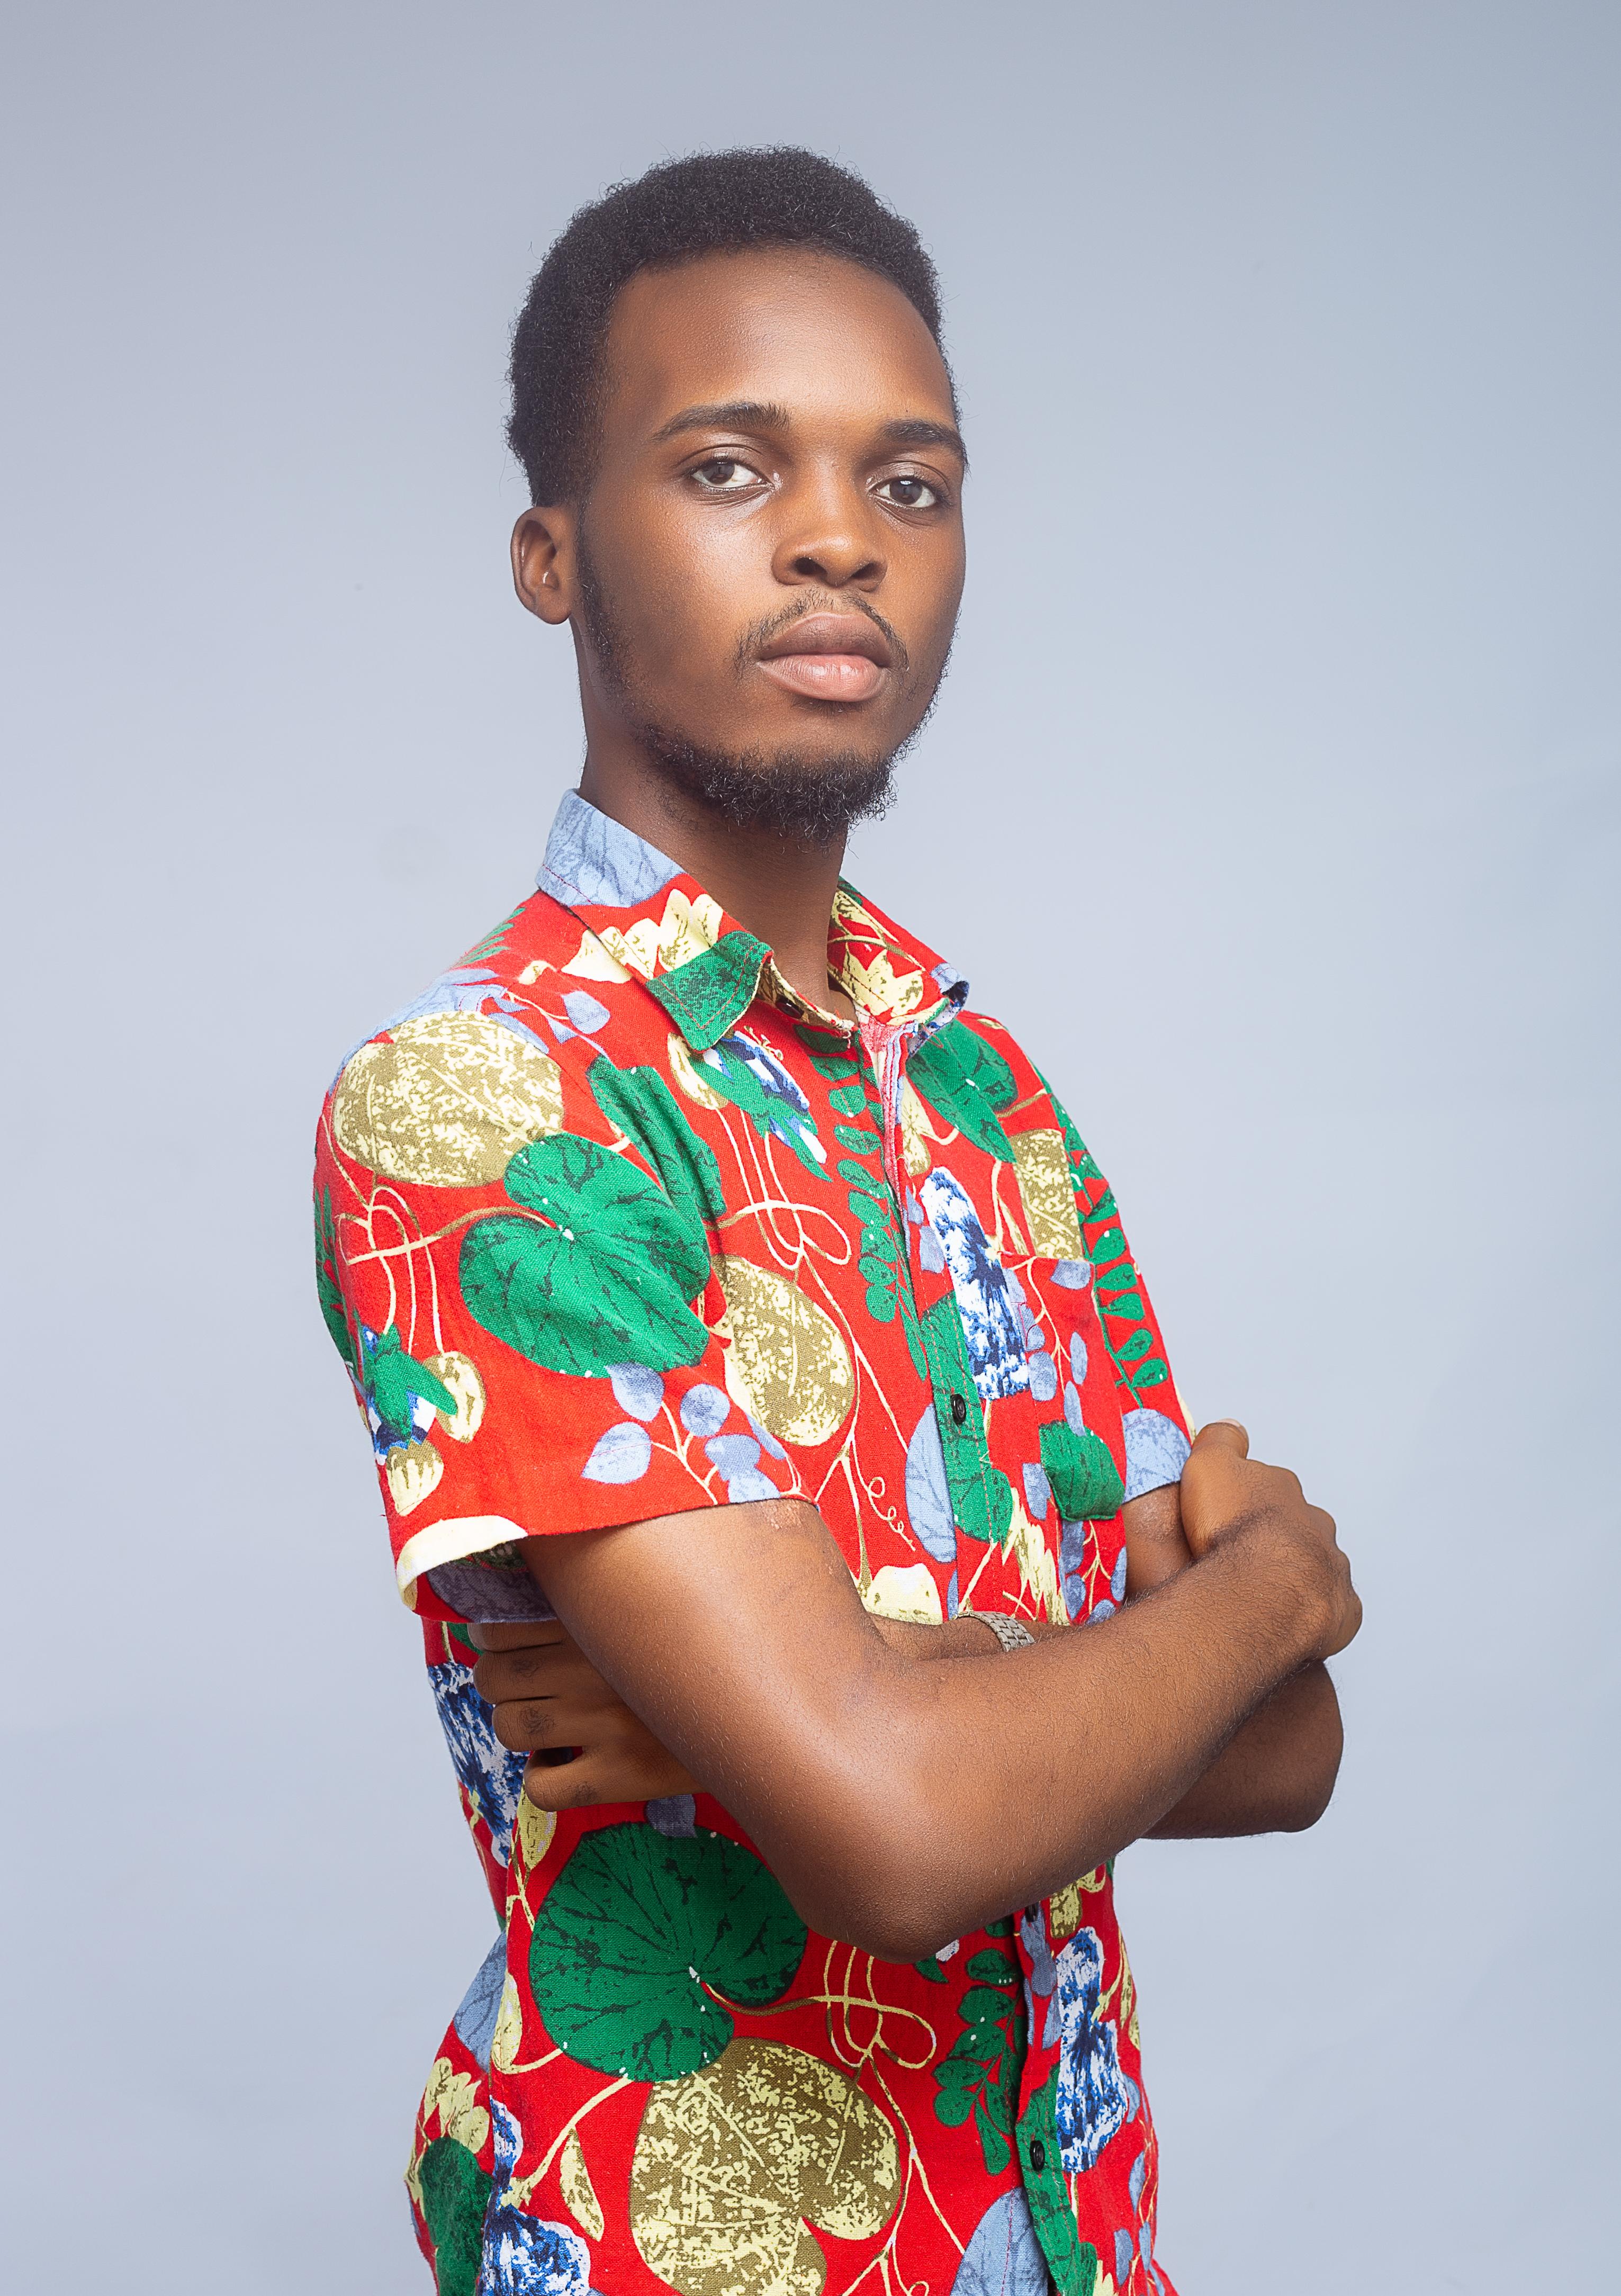 Sampson Mawu Amegah